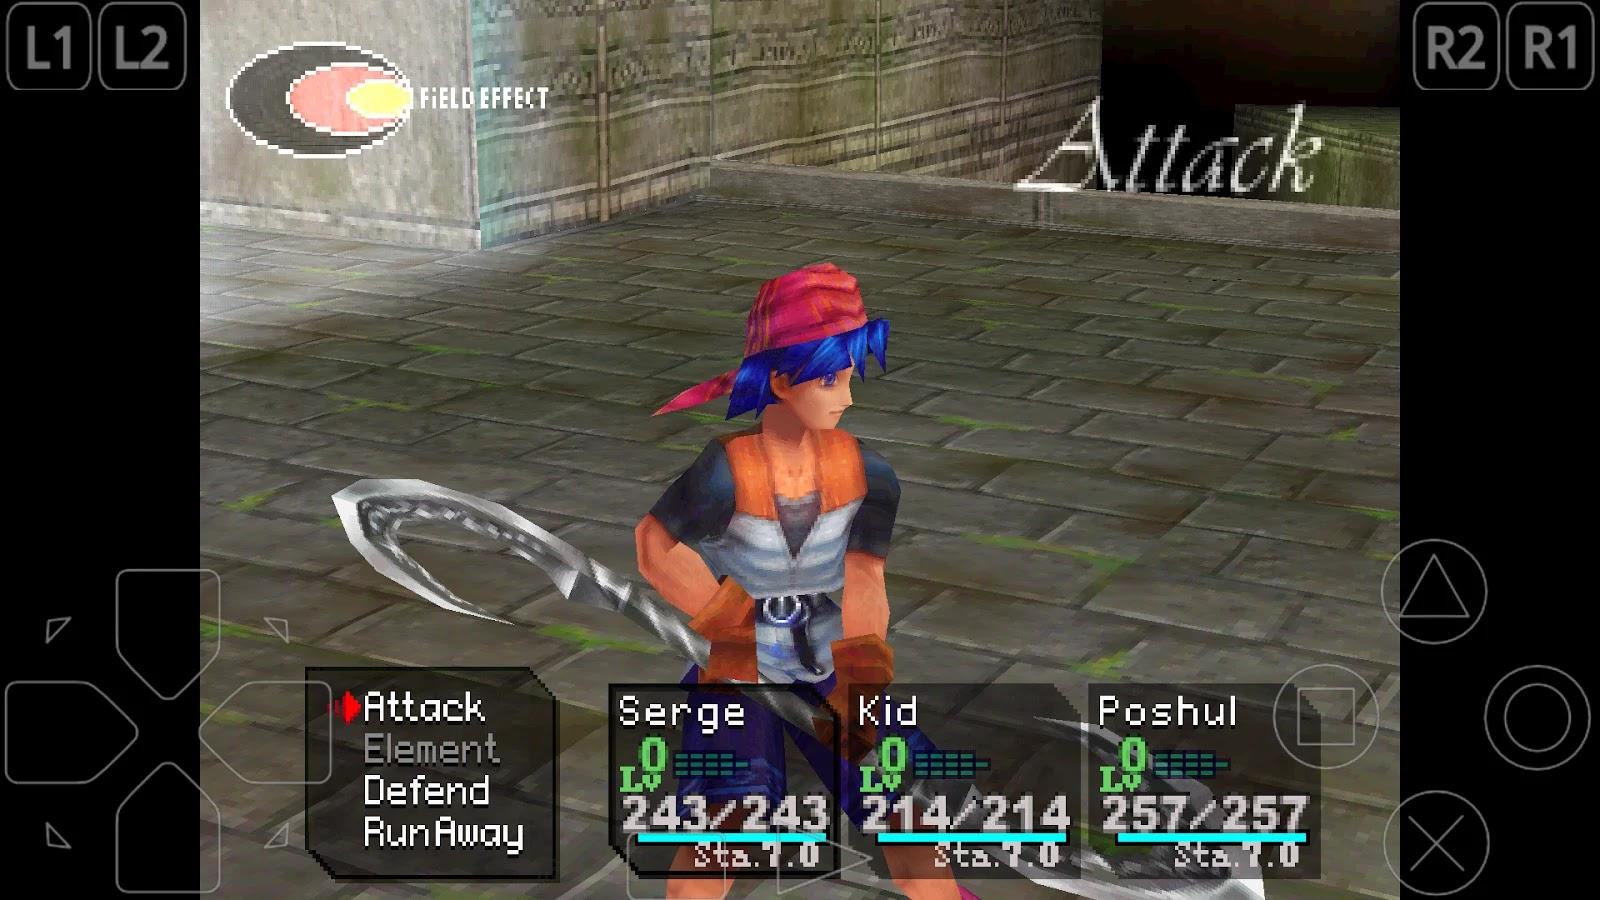 ePSXe[Playstation Emulator] 1 9 20 Apk+Roms+Bios